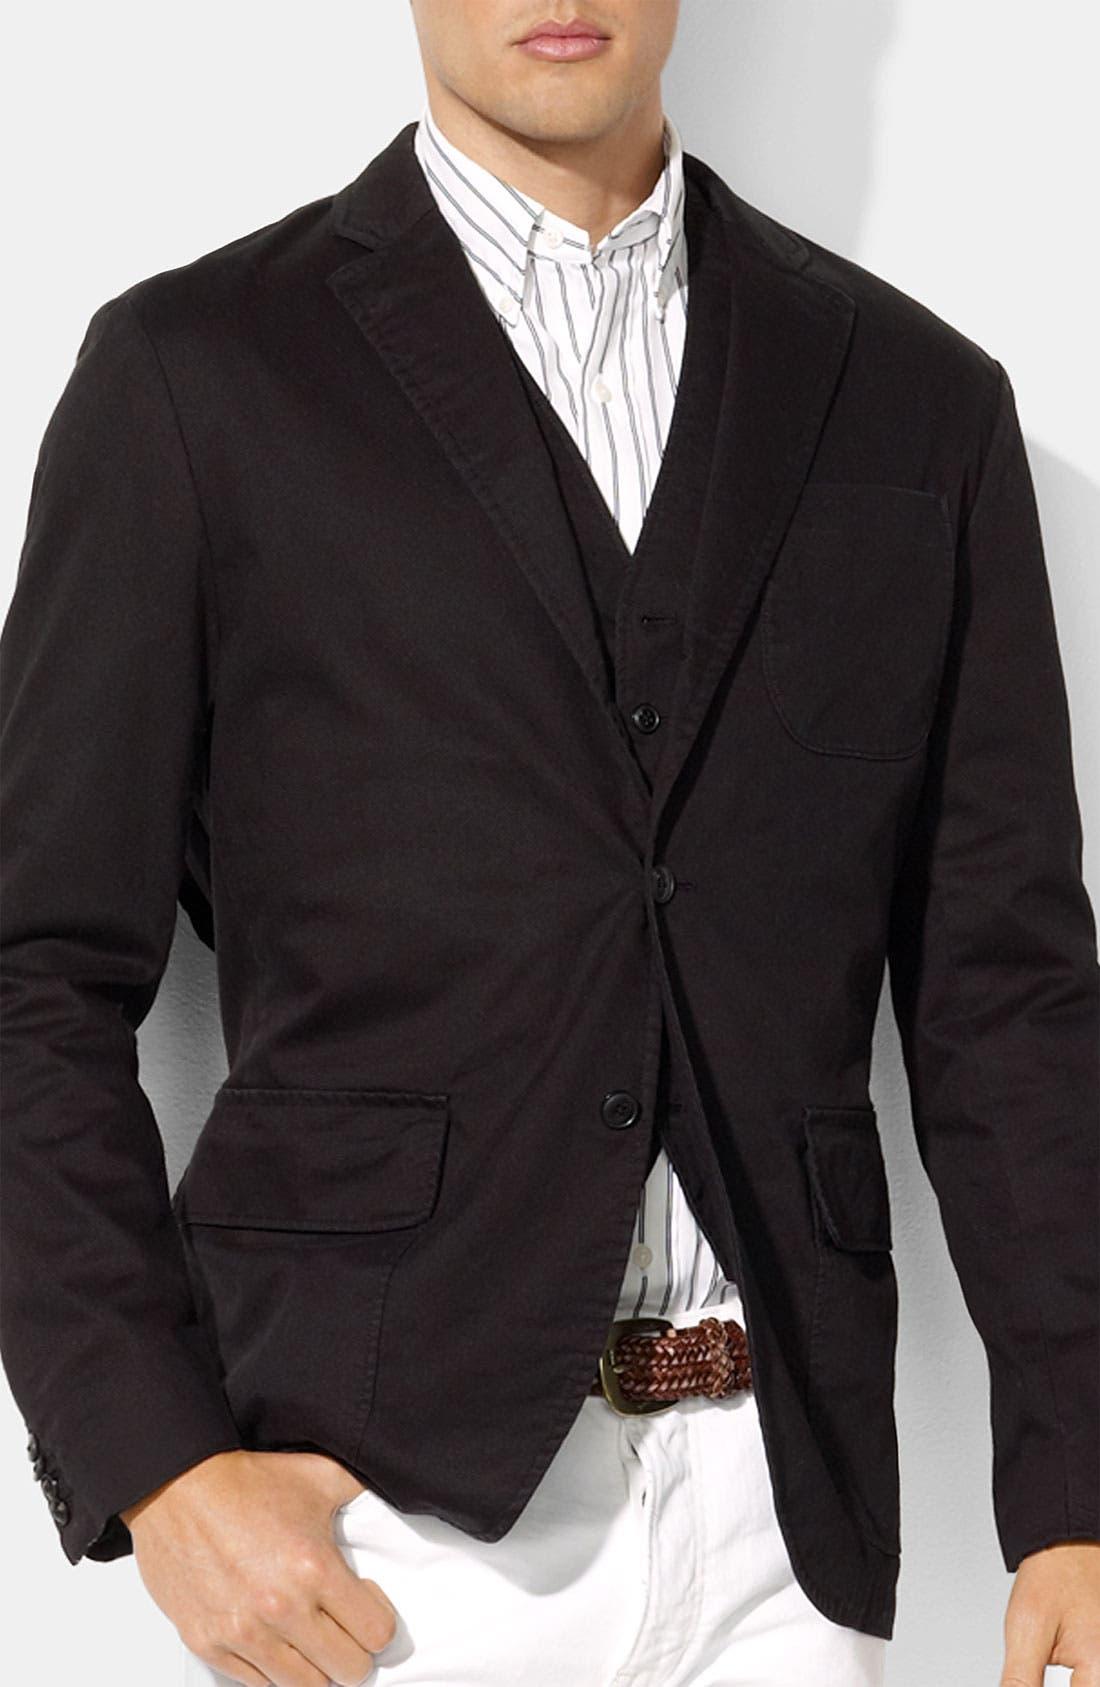 Main Image - Polo Ralph Lauren 'Leverett' Classic Fit Sportcoat